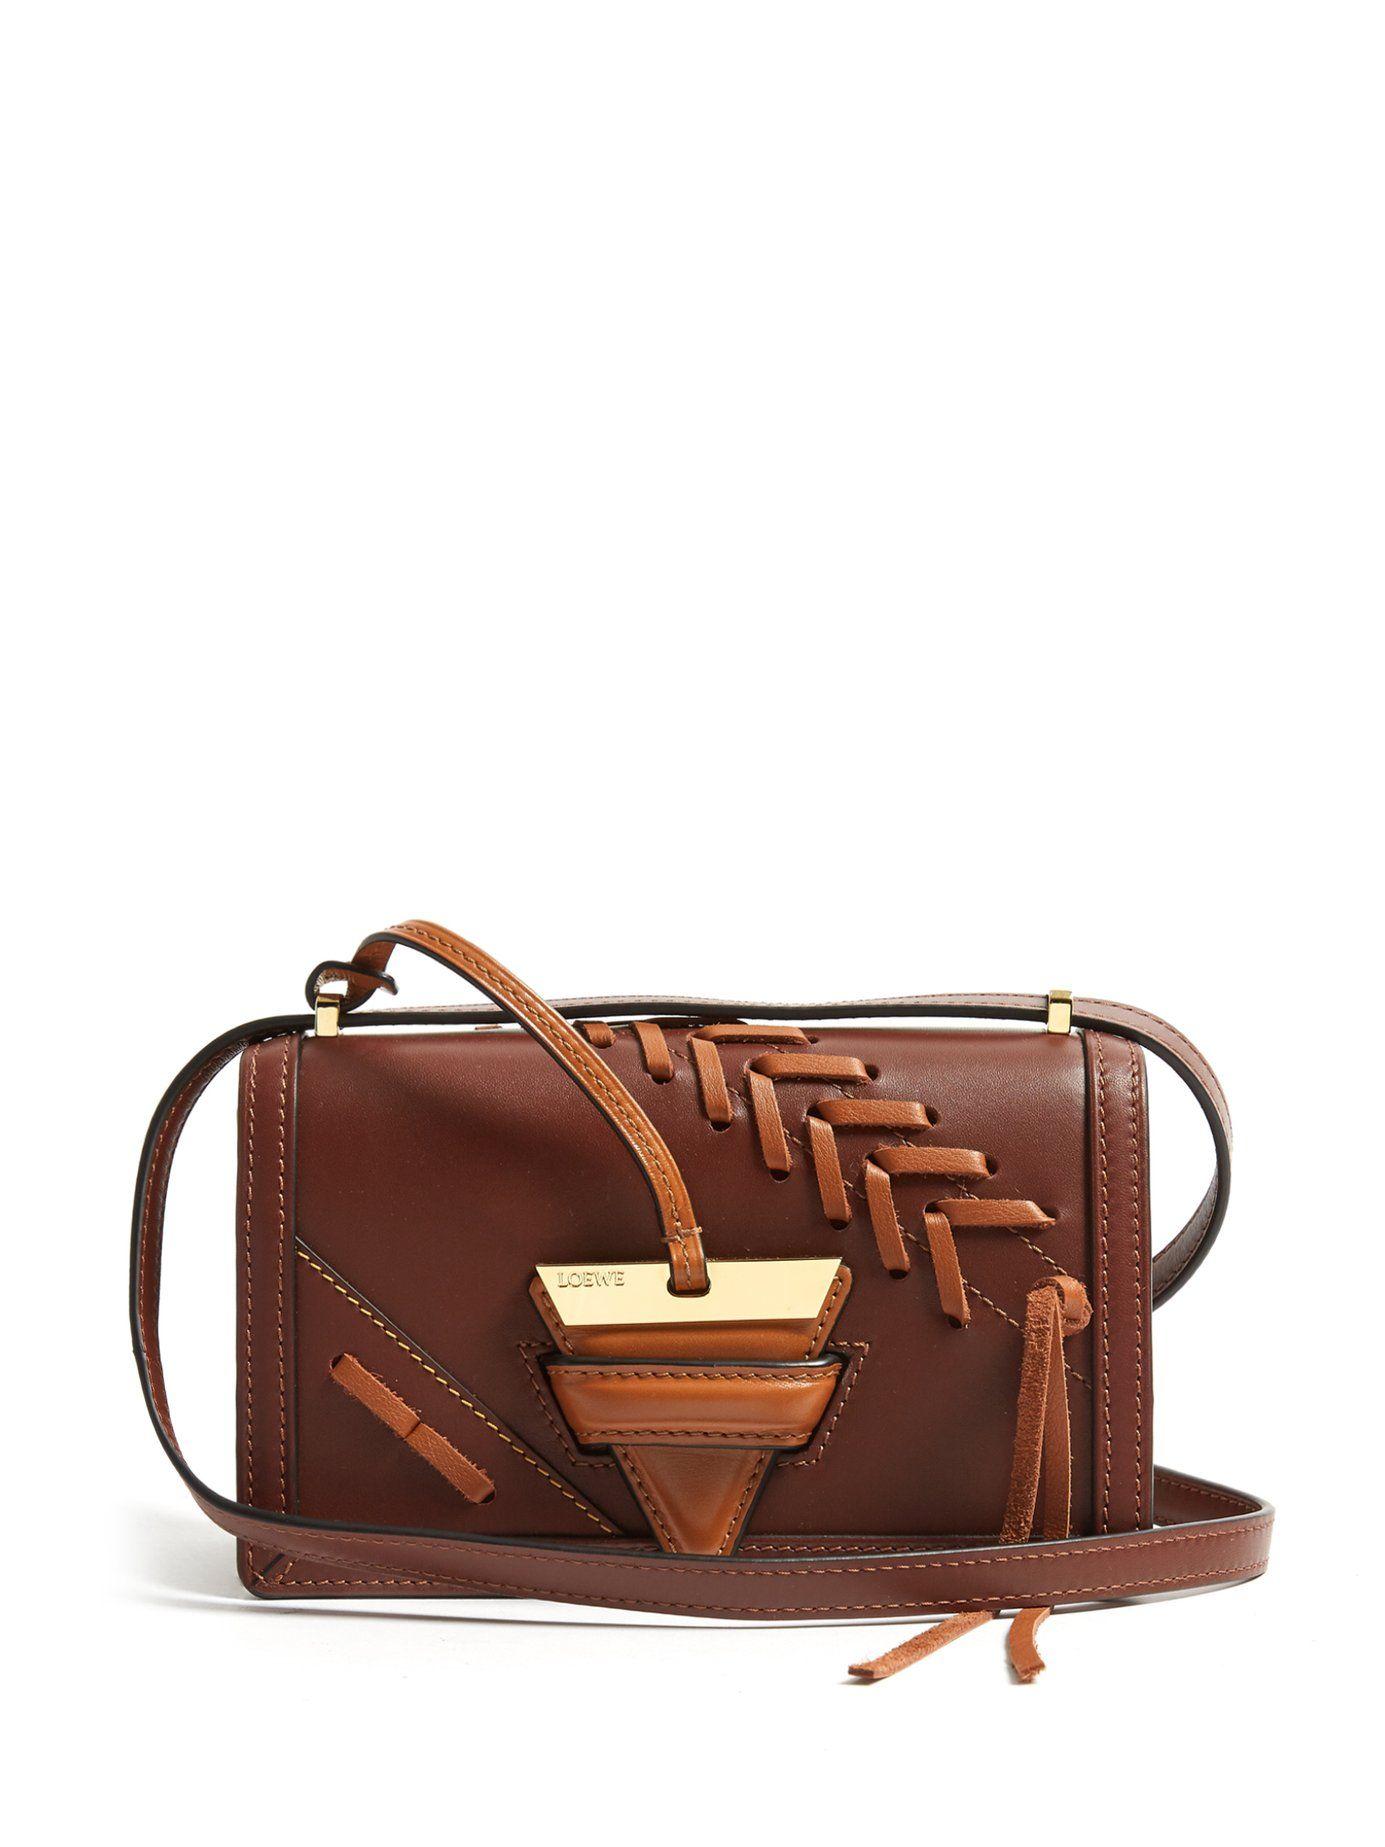 c30420474370 Loewe Barcelona Small Leather Cross-Body Bag In Tae